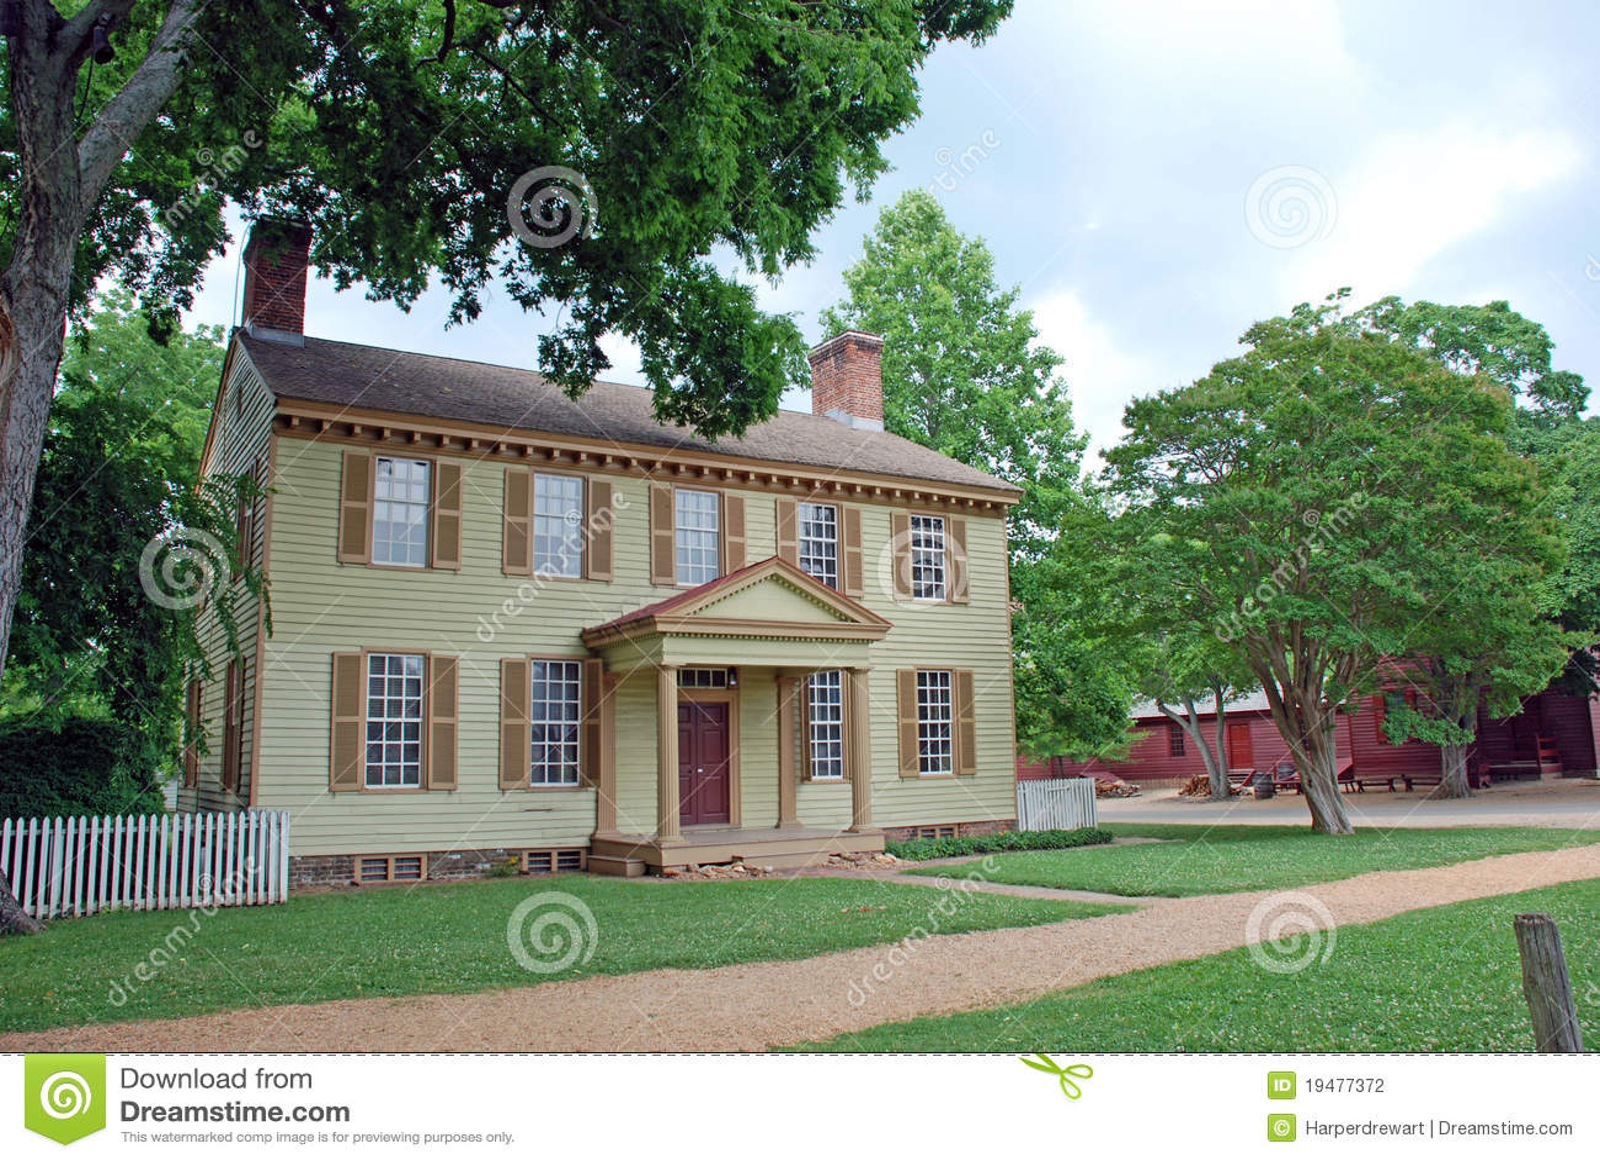 Maison Coloniale Photographie Stock Image 19477372